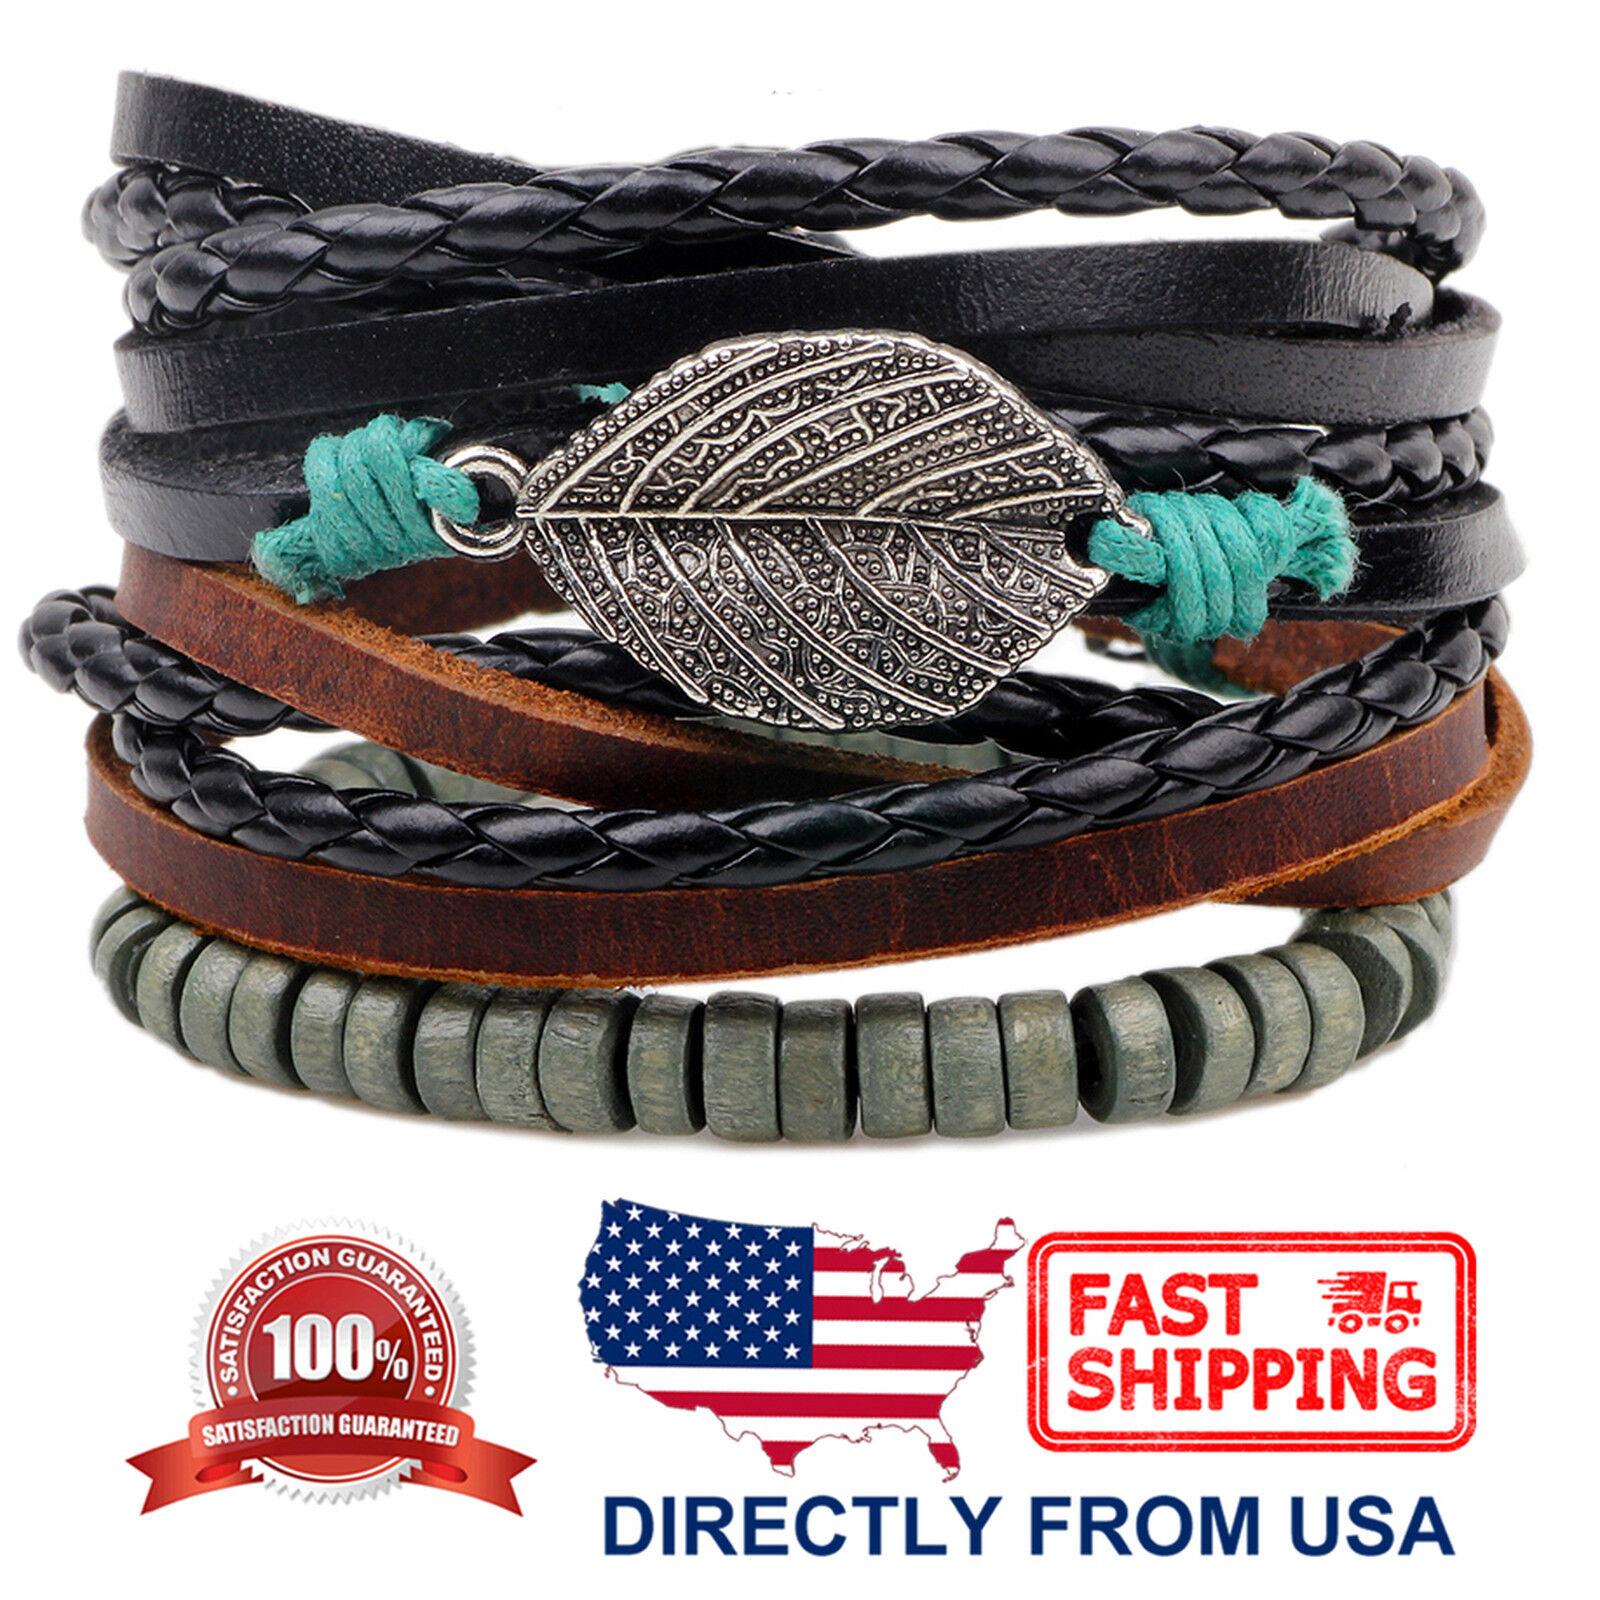 Tribal Wood Beads and Leaf Brown Leather Men Women Wristband Bracelet 3pcs Set Bracelets